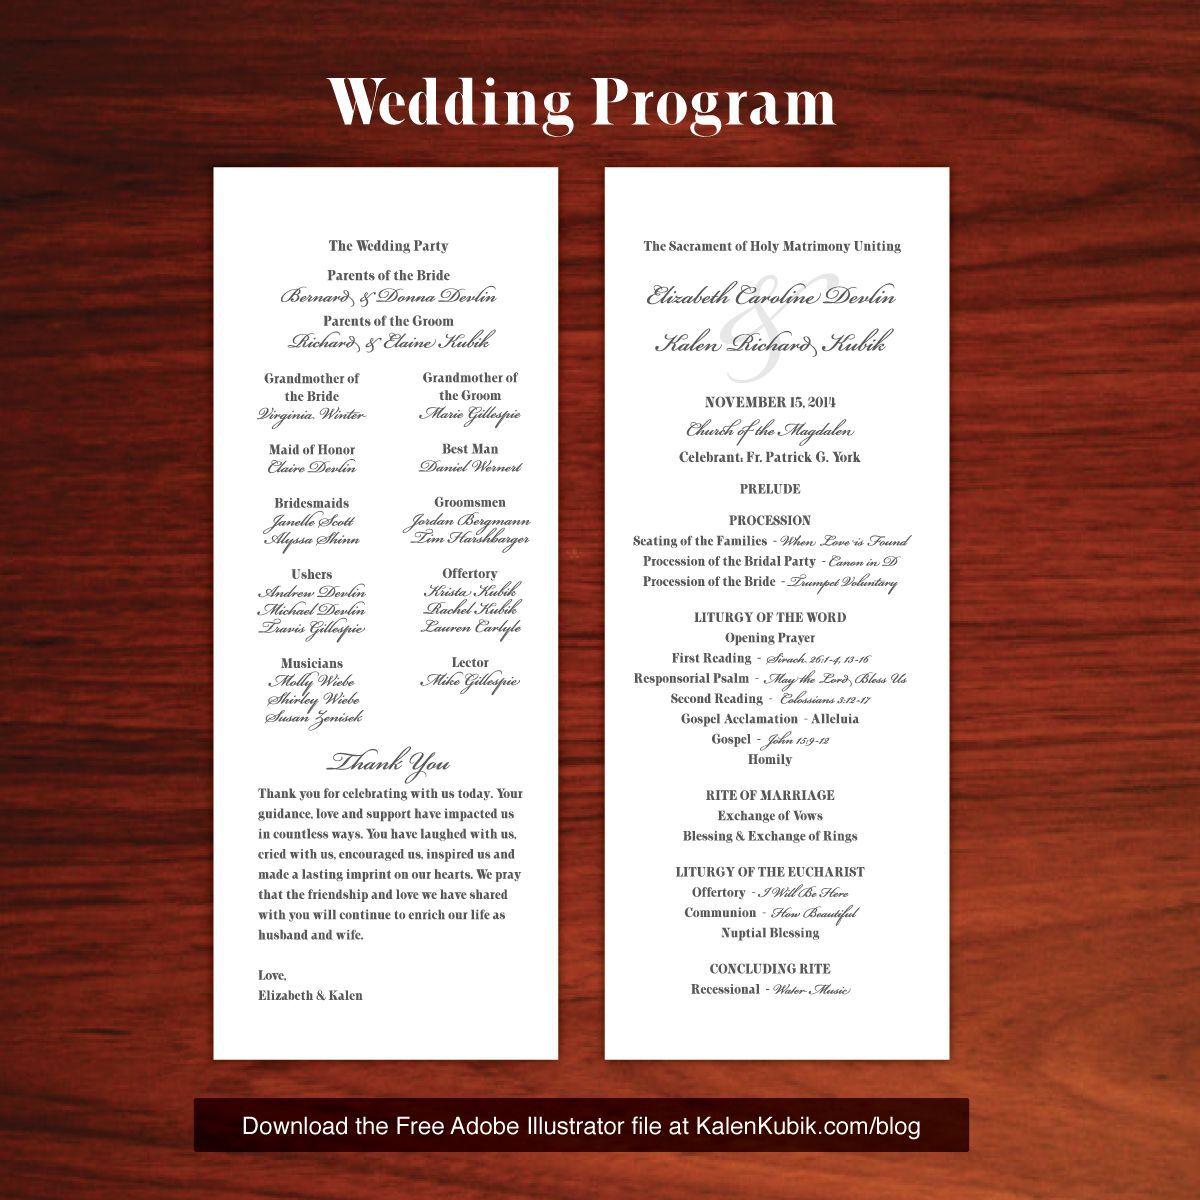 004 Stupendou Wedding Program Template Free Download Sample  Downloadable Pdf Reception Microsoft Word FanFull